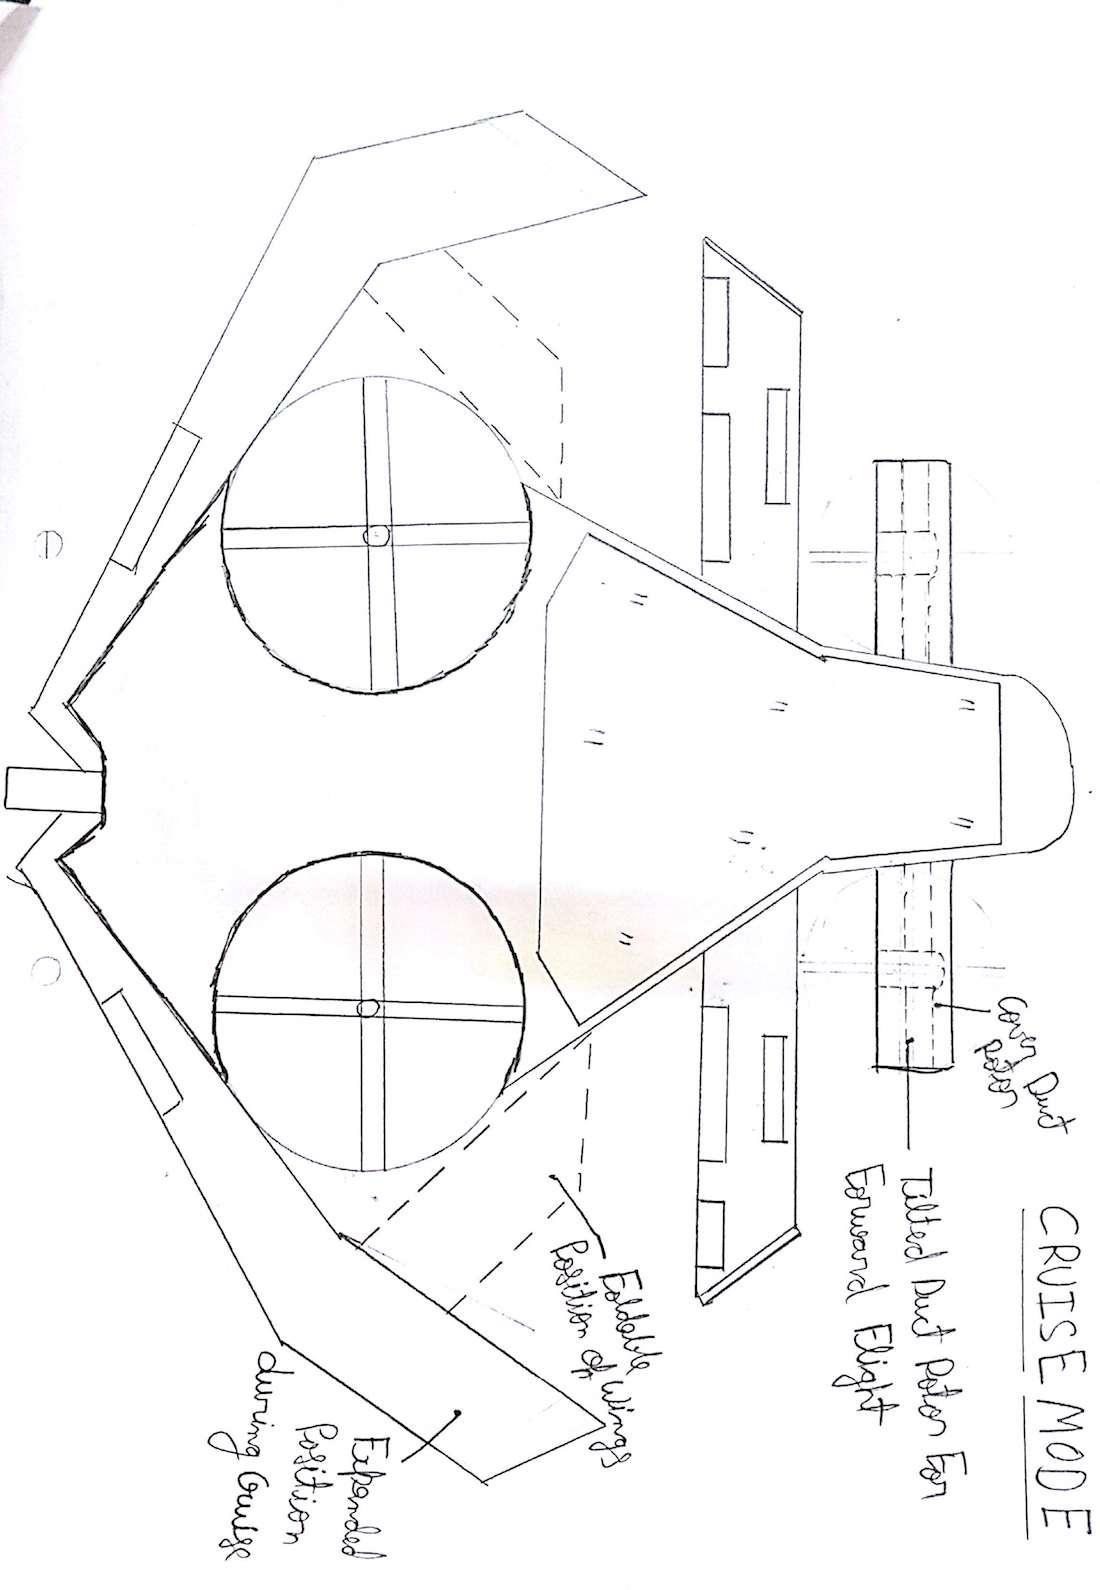 Evtol Foldable Wing Aircraft Create The Future Design